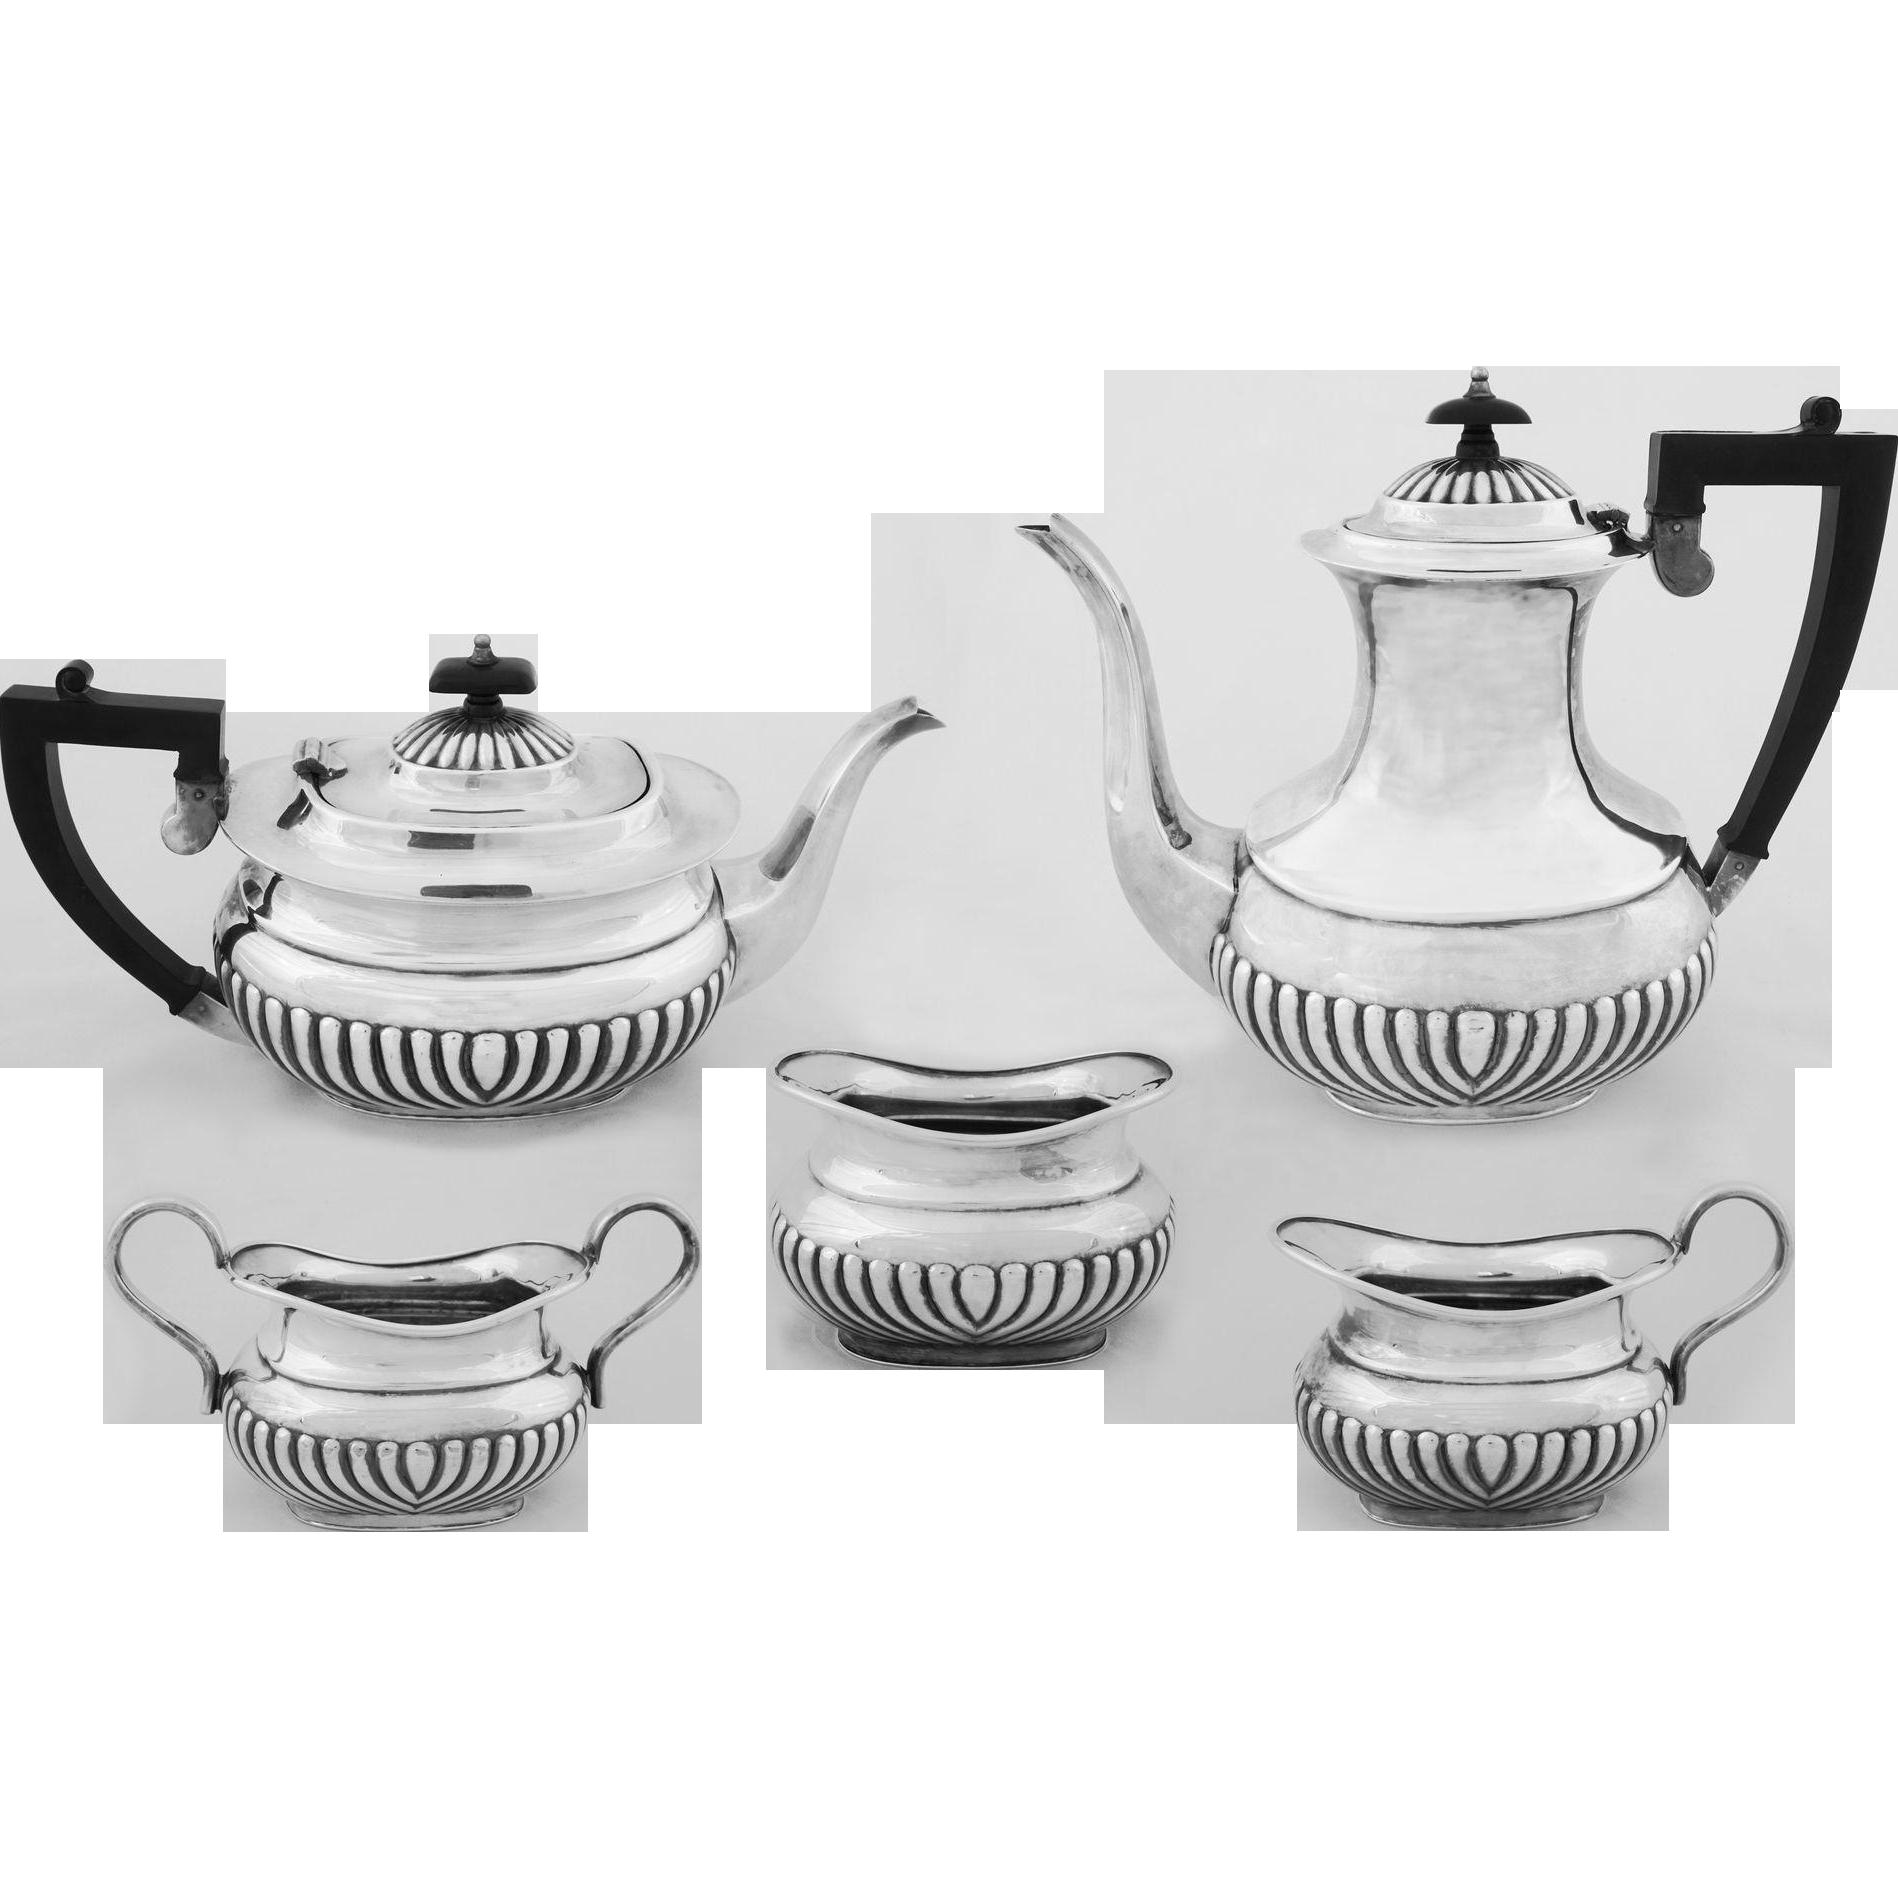 English Sheffield 5 Pc Set Coffee Tea Pot, Cream, Handled Sugar, Open Bowl, Ebonized Handles, Silverplate - 20th Century, England